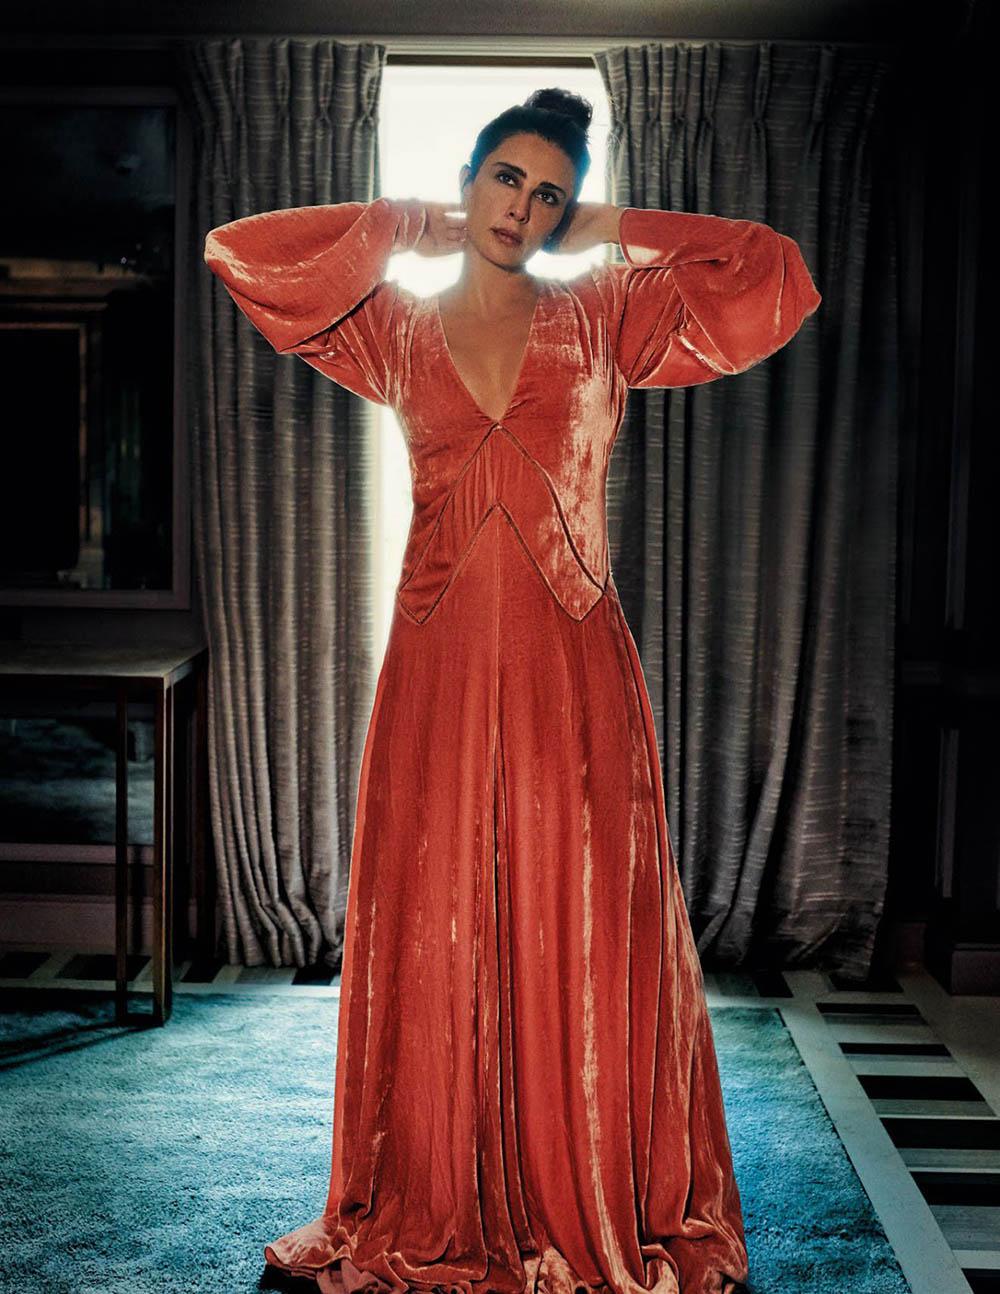 Nadine Labaki covers Vogue Arabia October 2018 by Drew Jarrett